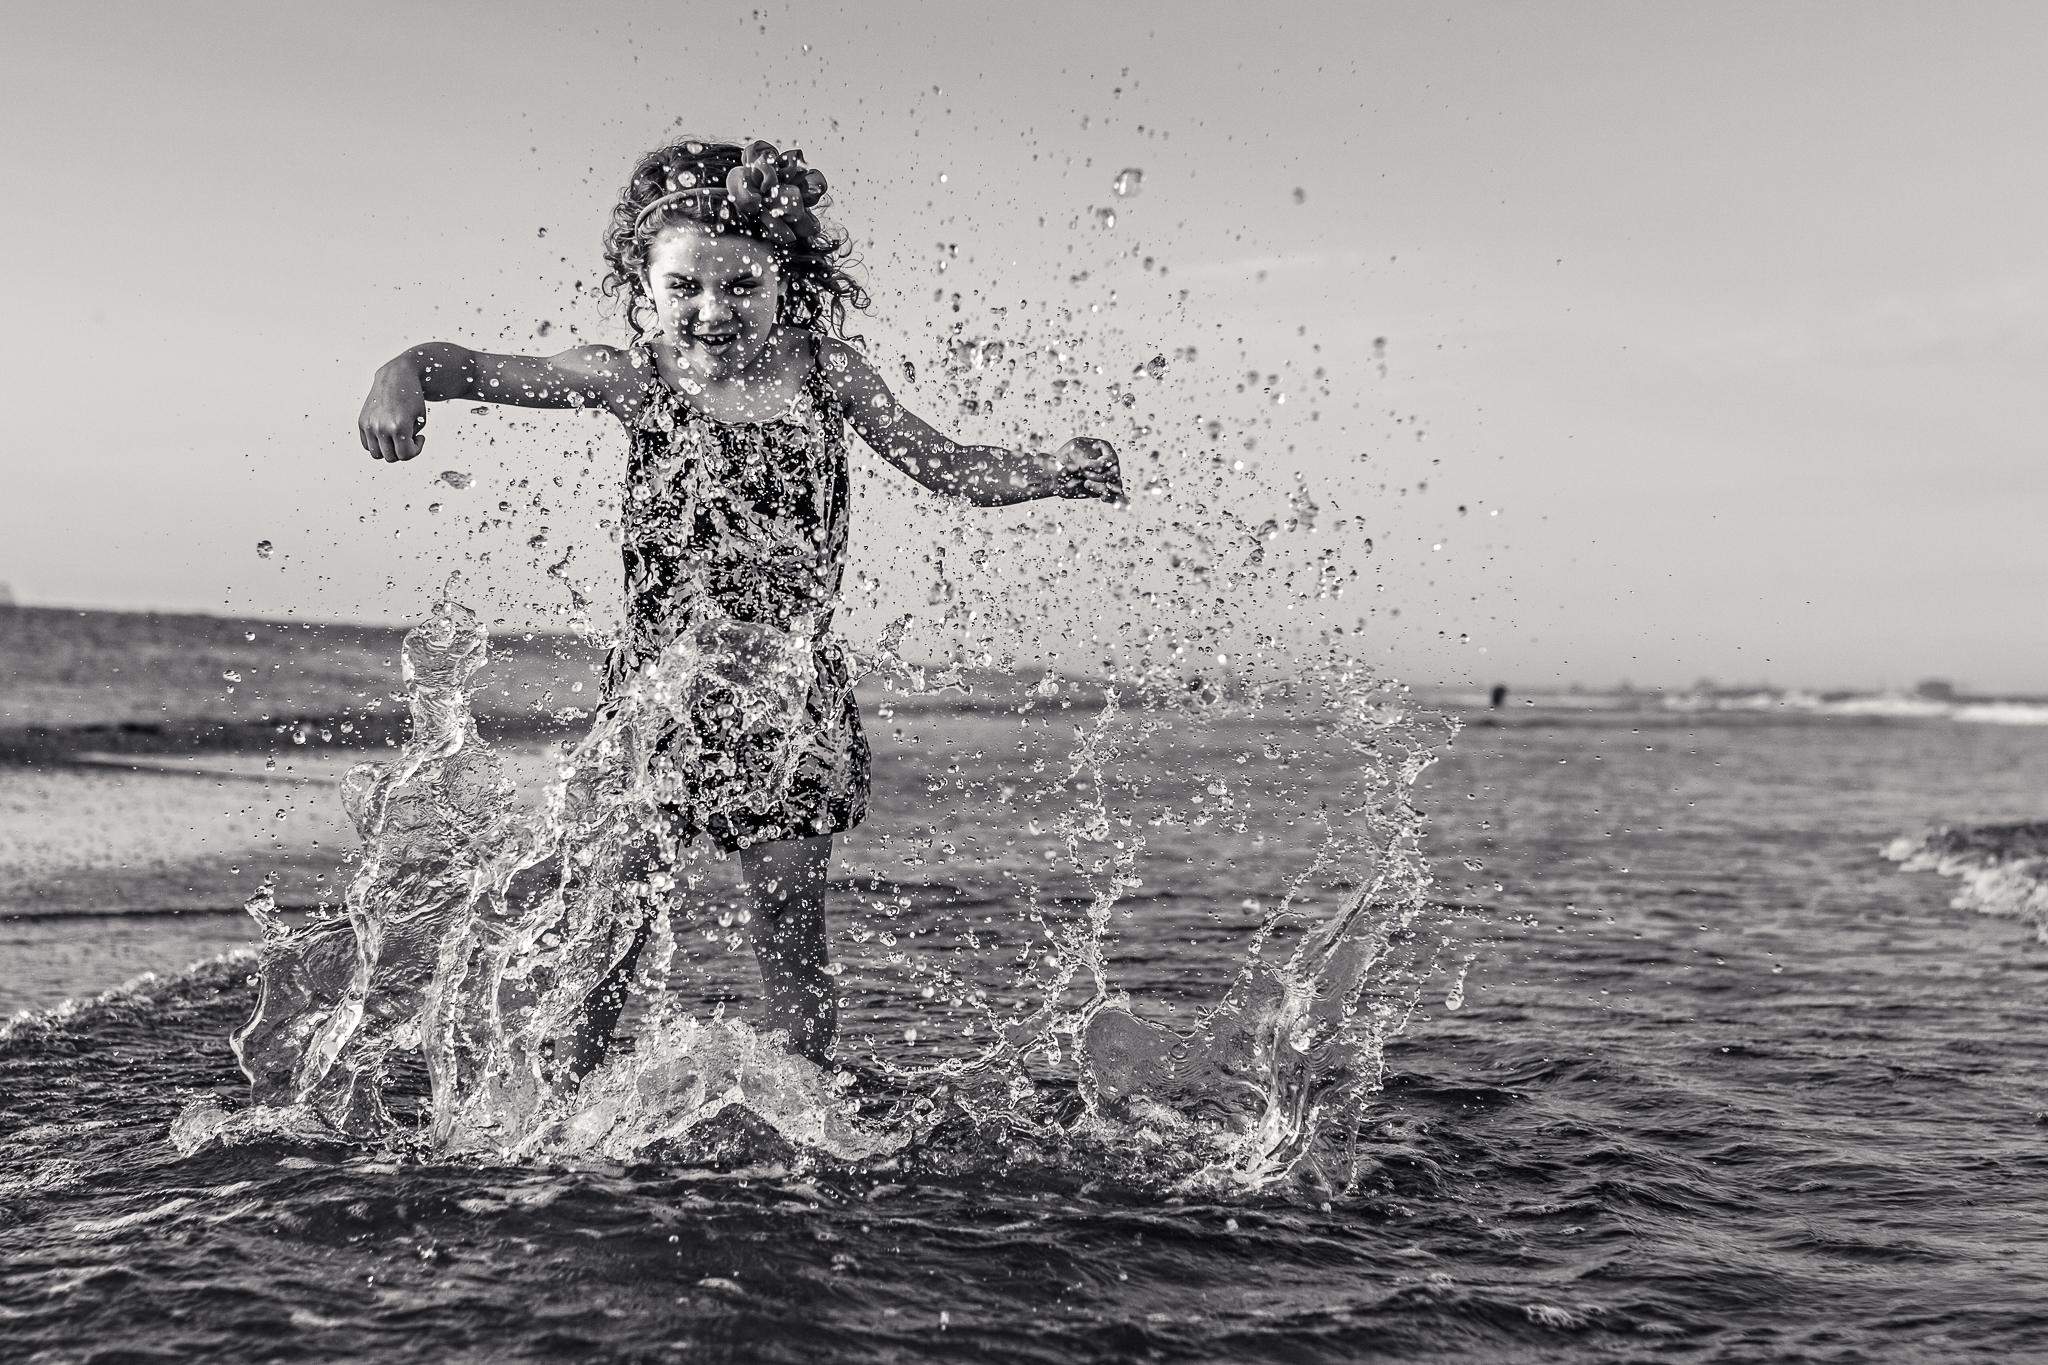 NancyElizabethPhotography, South Jersey Photographer, Kicking Ocean Water